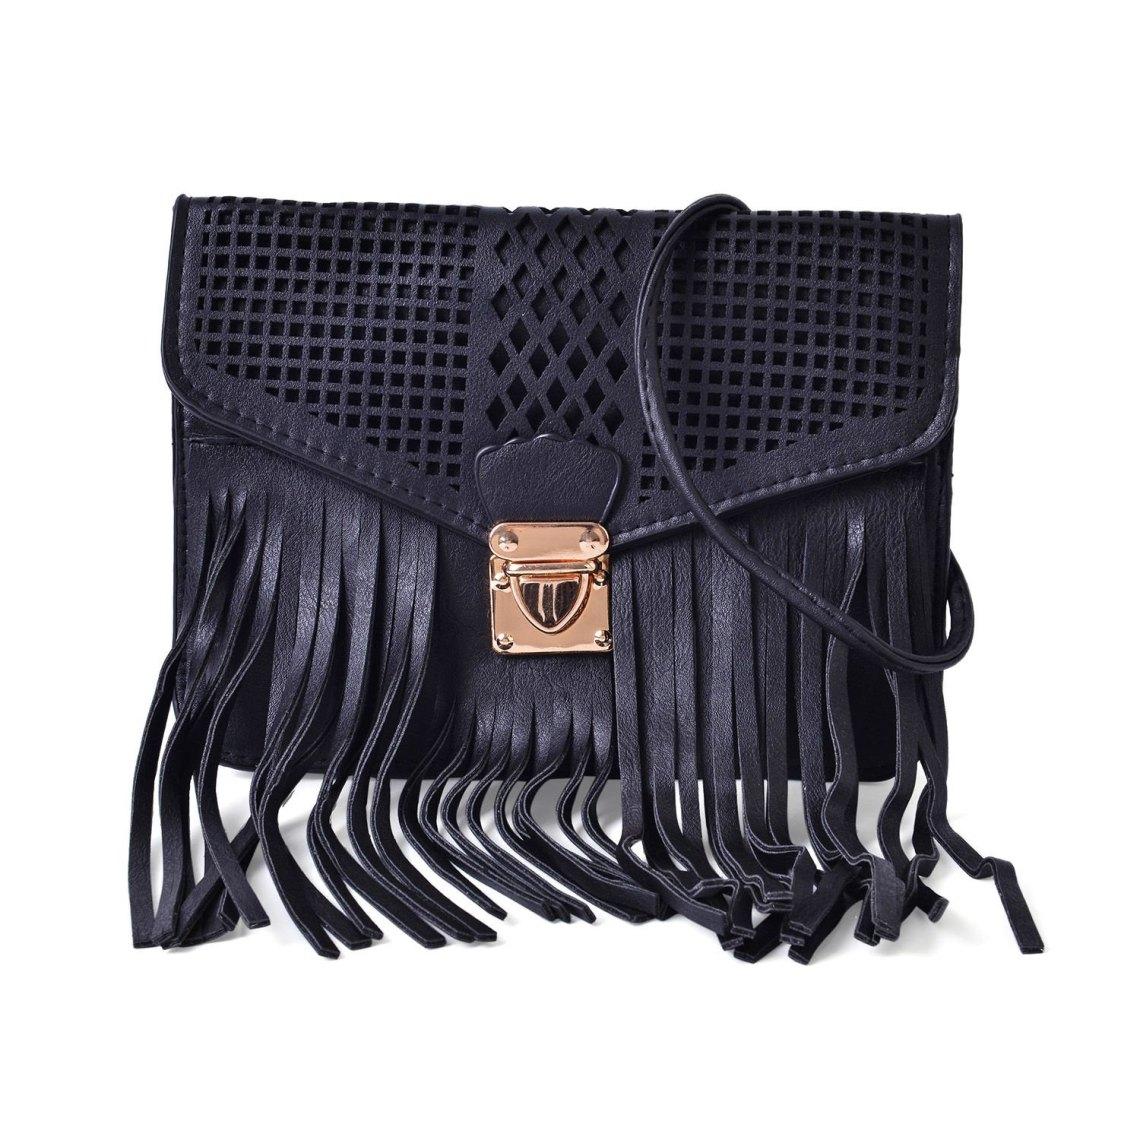 J Francis - Black Faux Leather Crossbody Bag